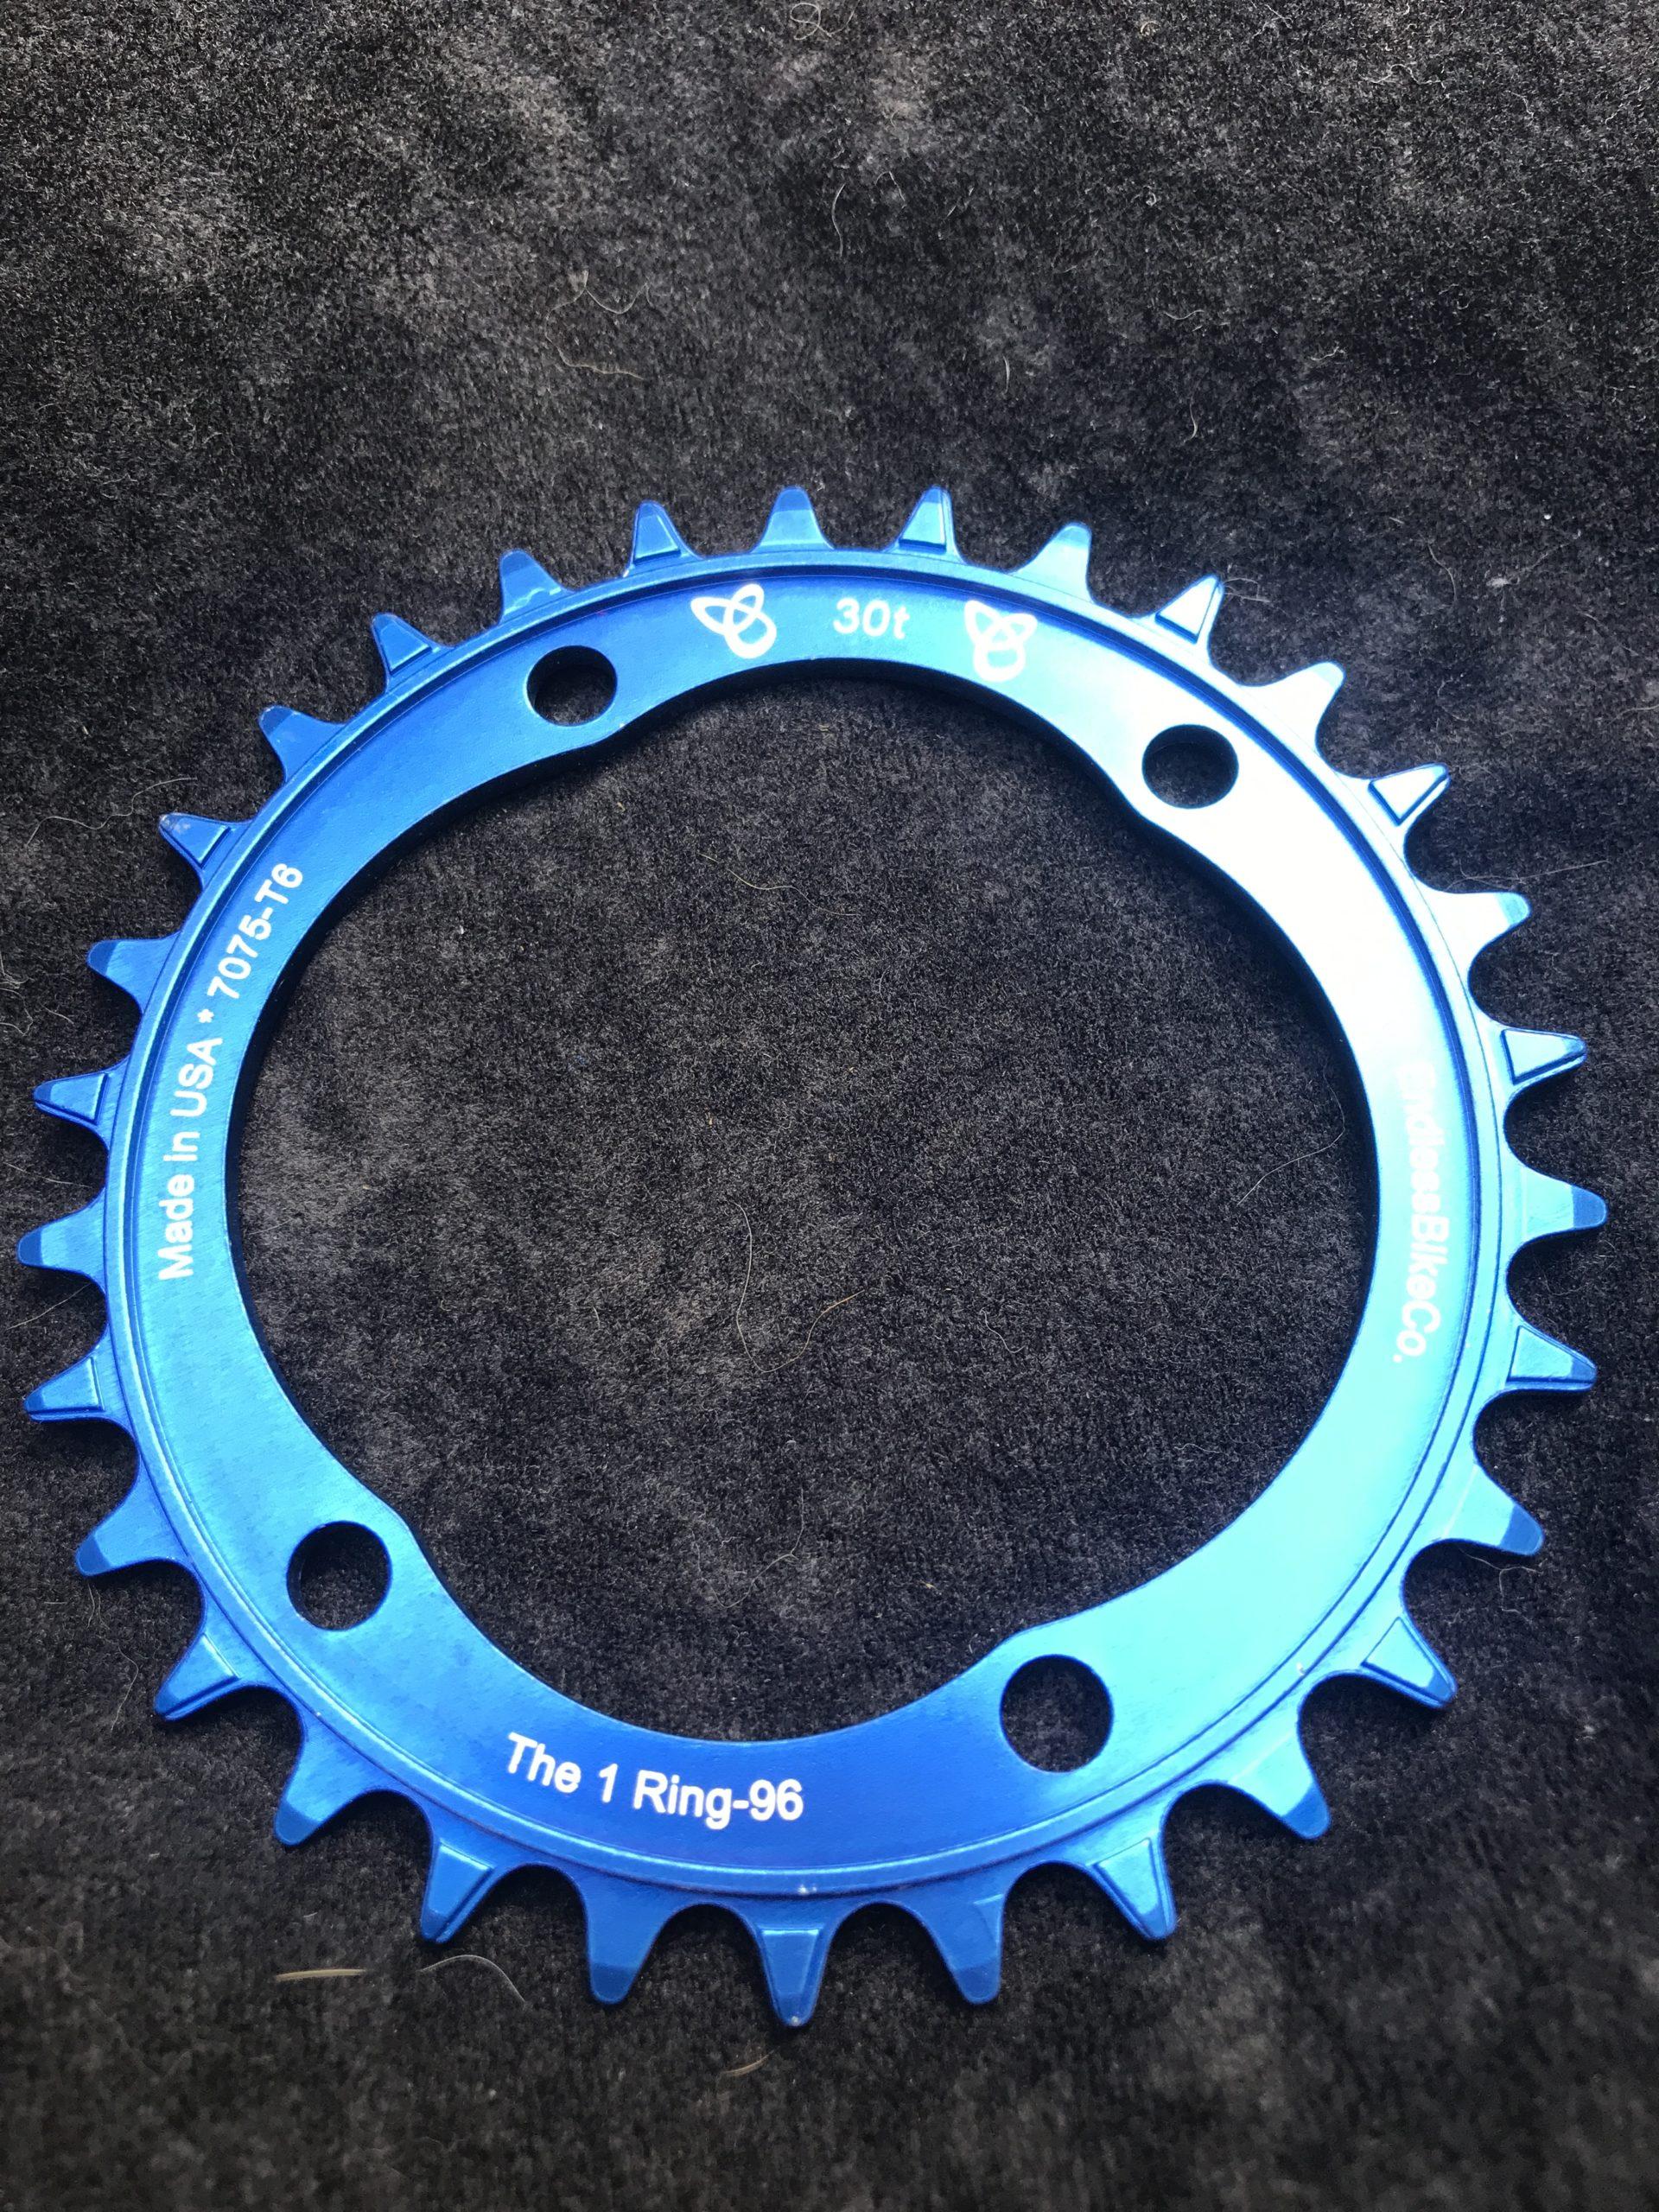 Shimano XT chainring 30t blue